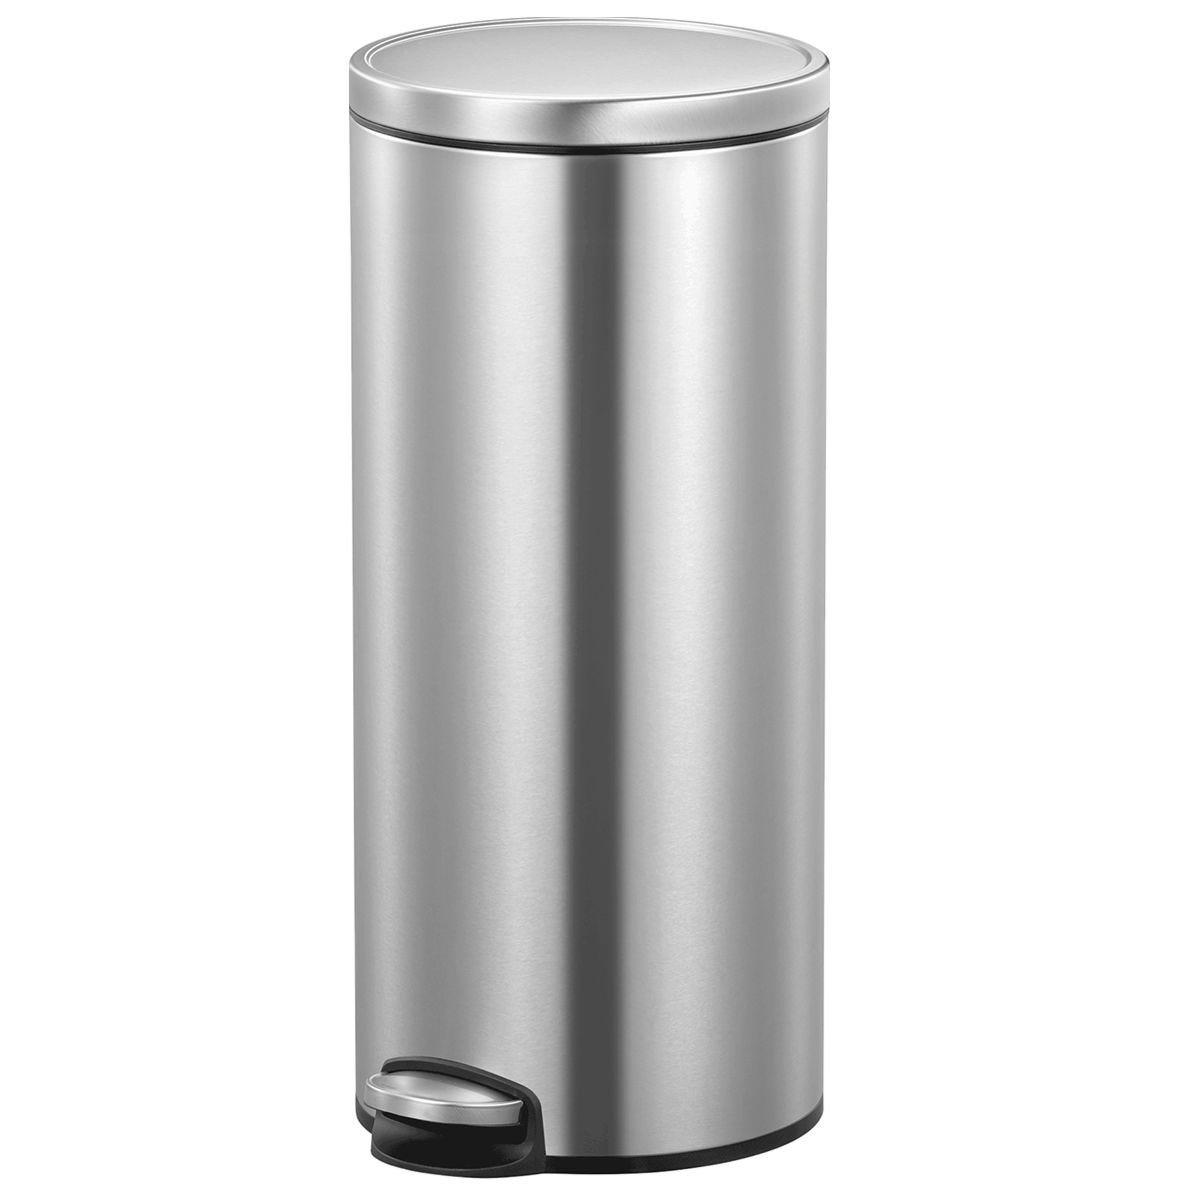 EKO Eva Kitchen Bin 30L - Stainless Steel